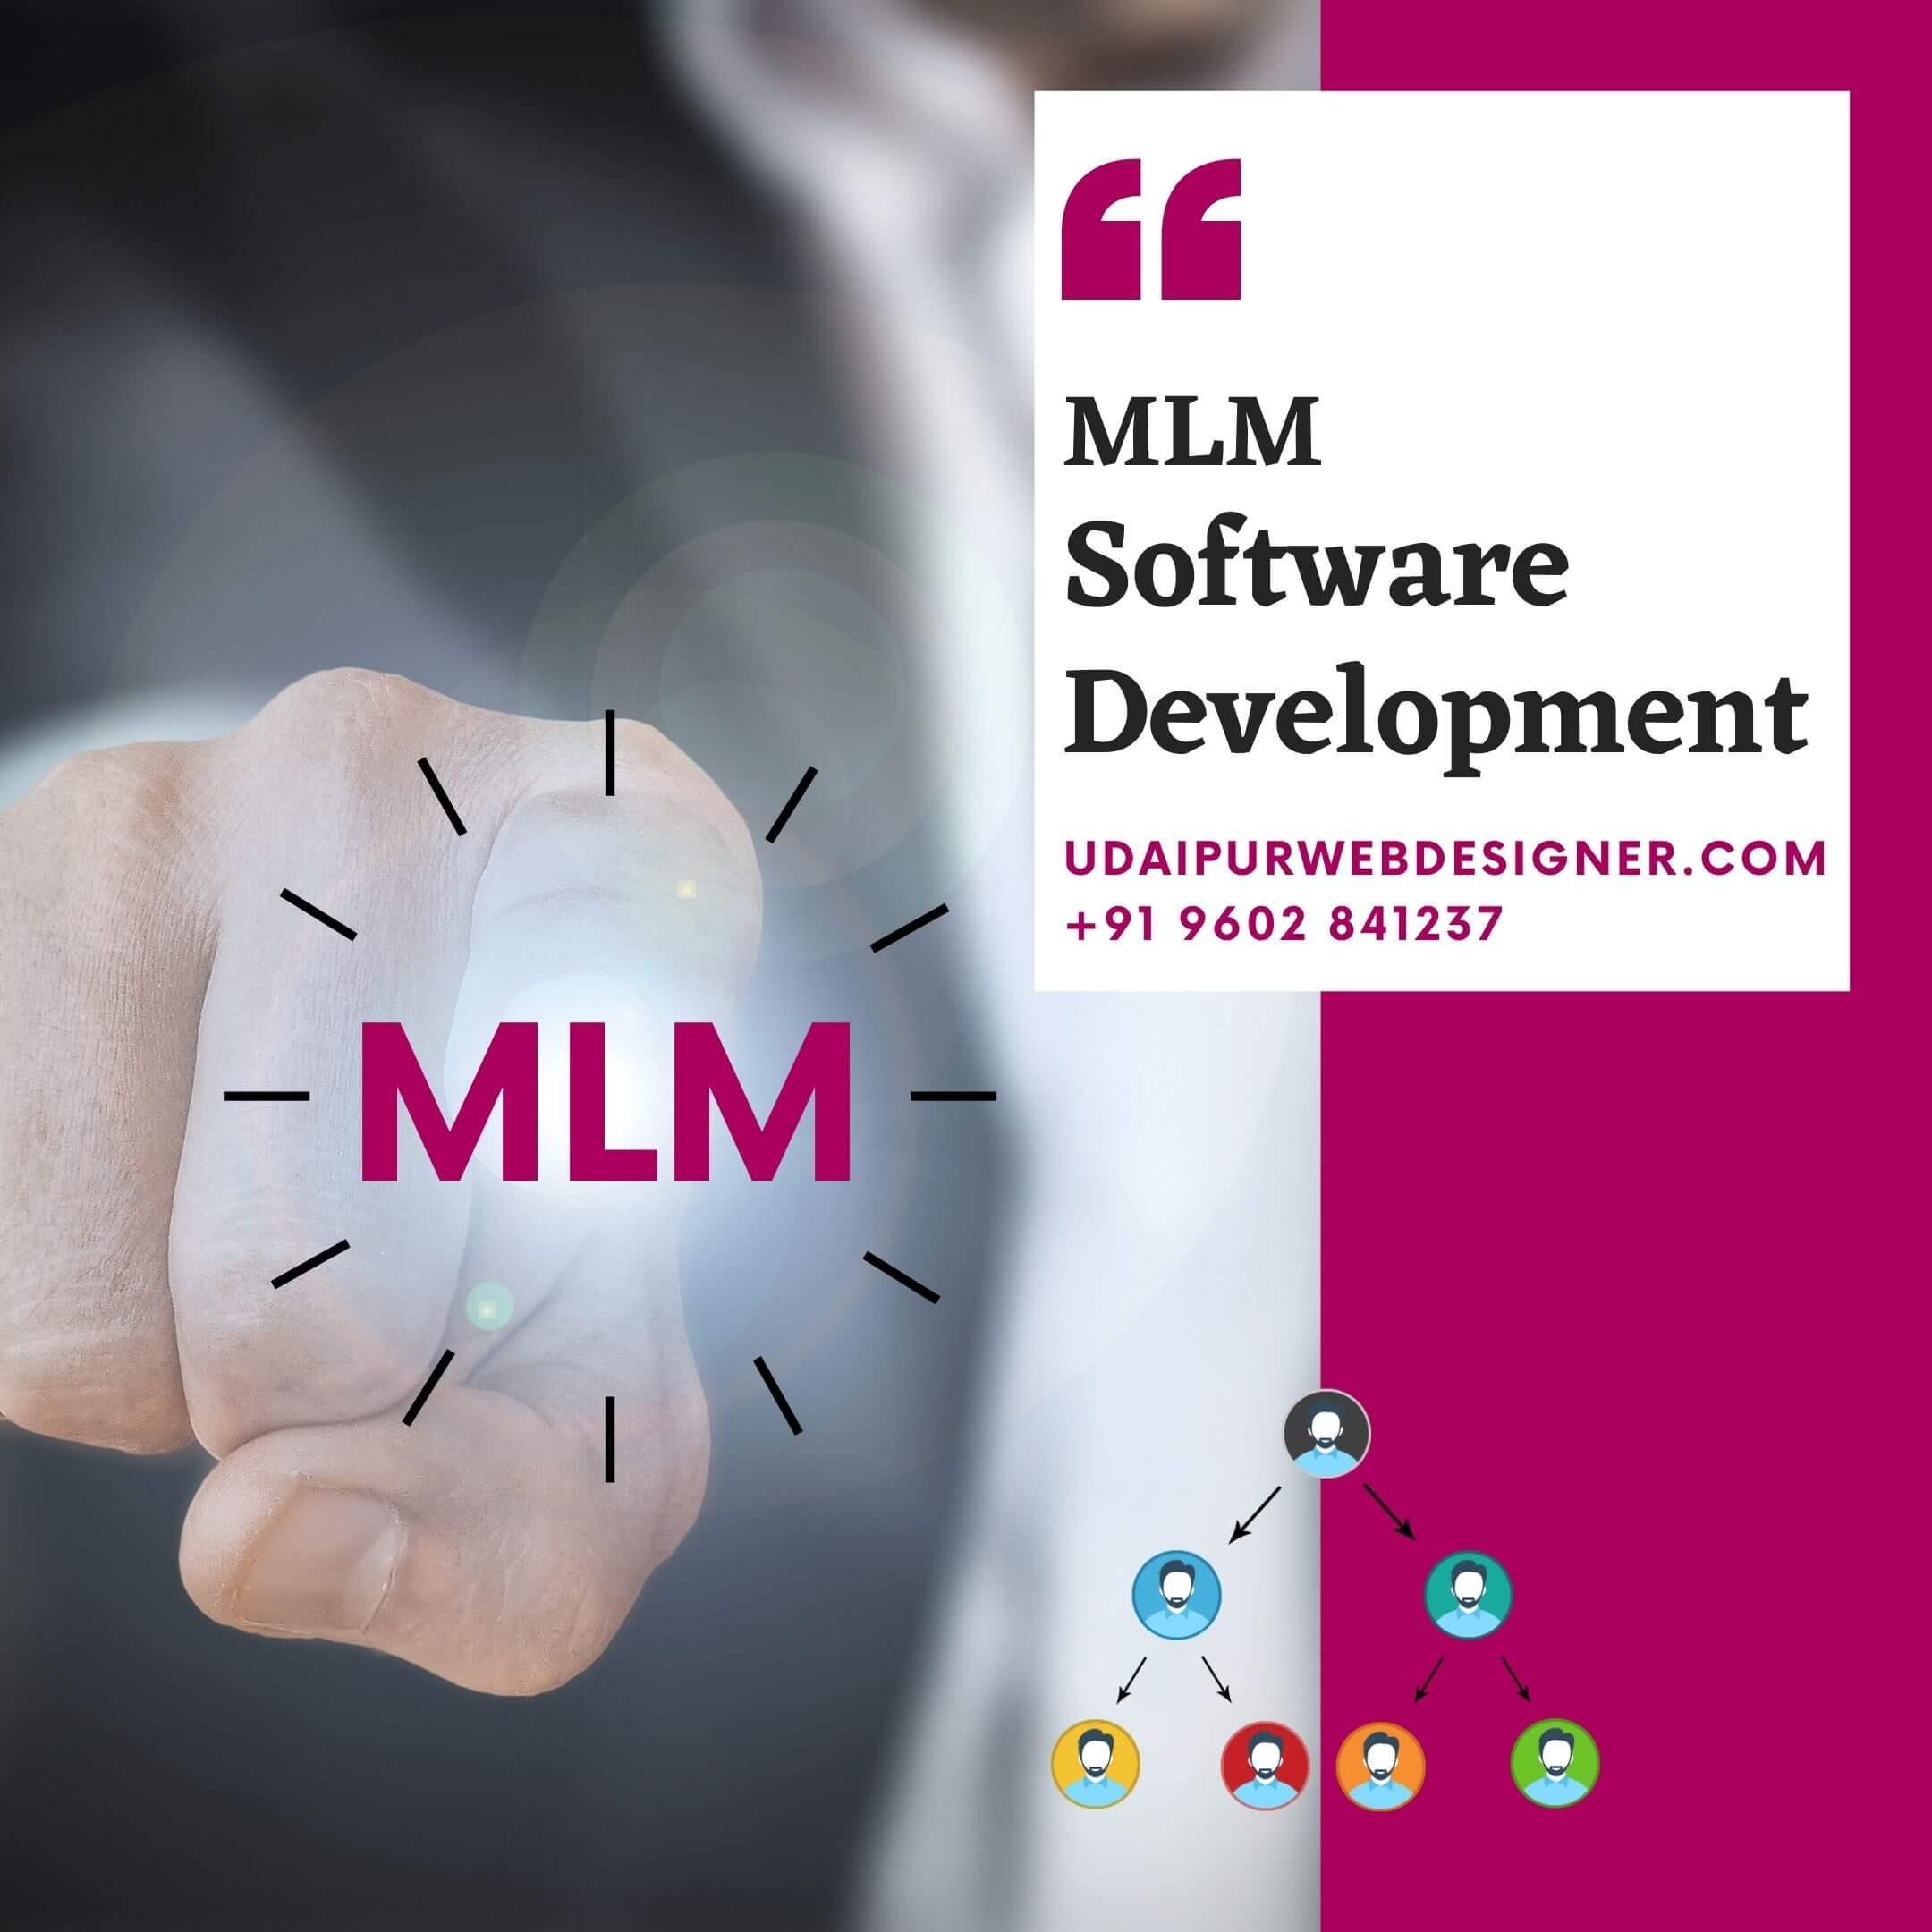 MLM Software Development